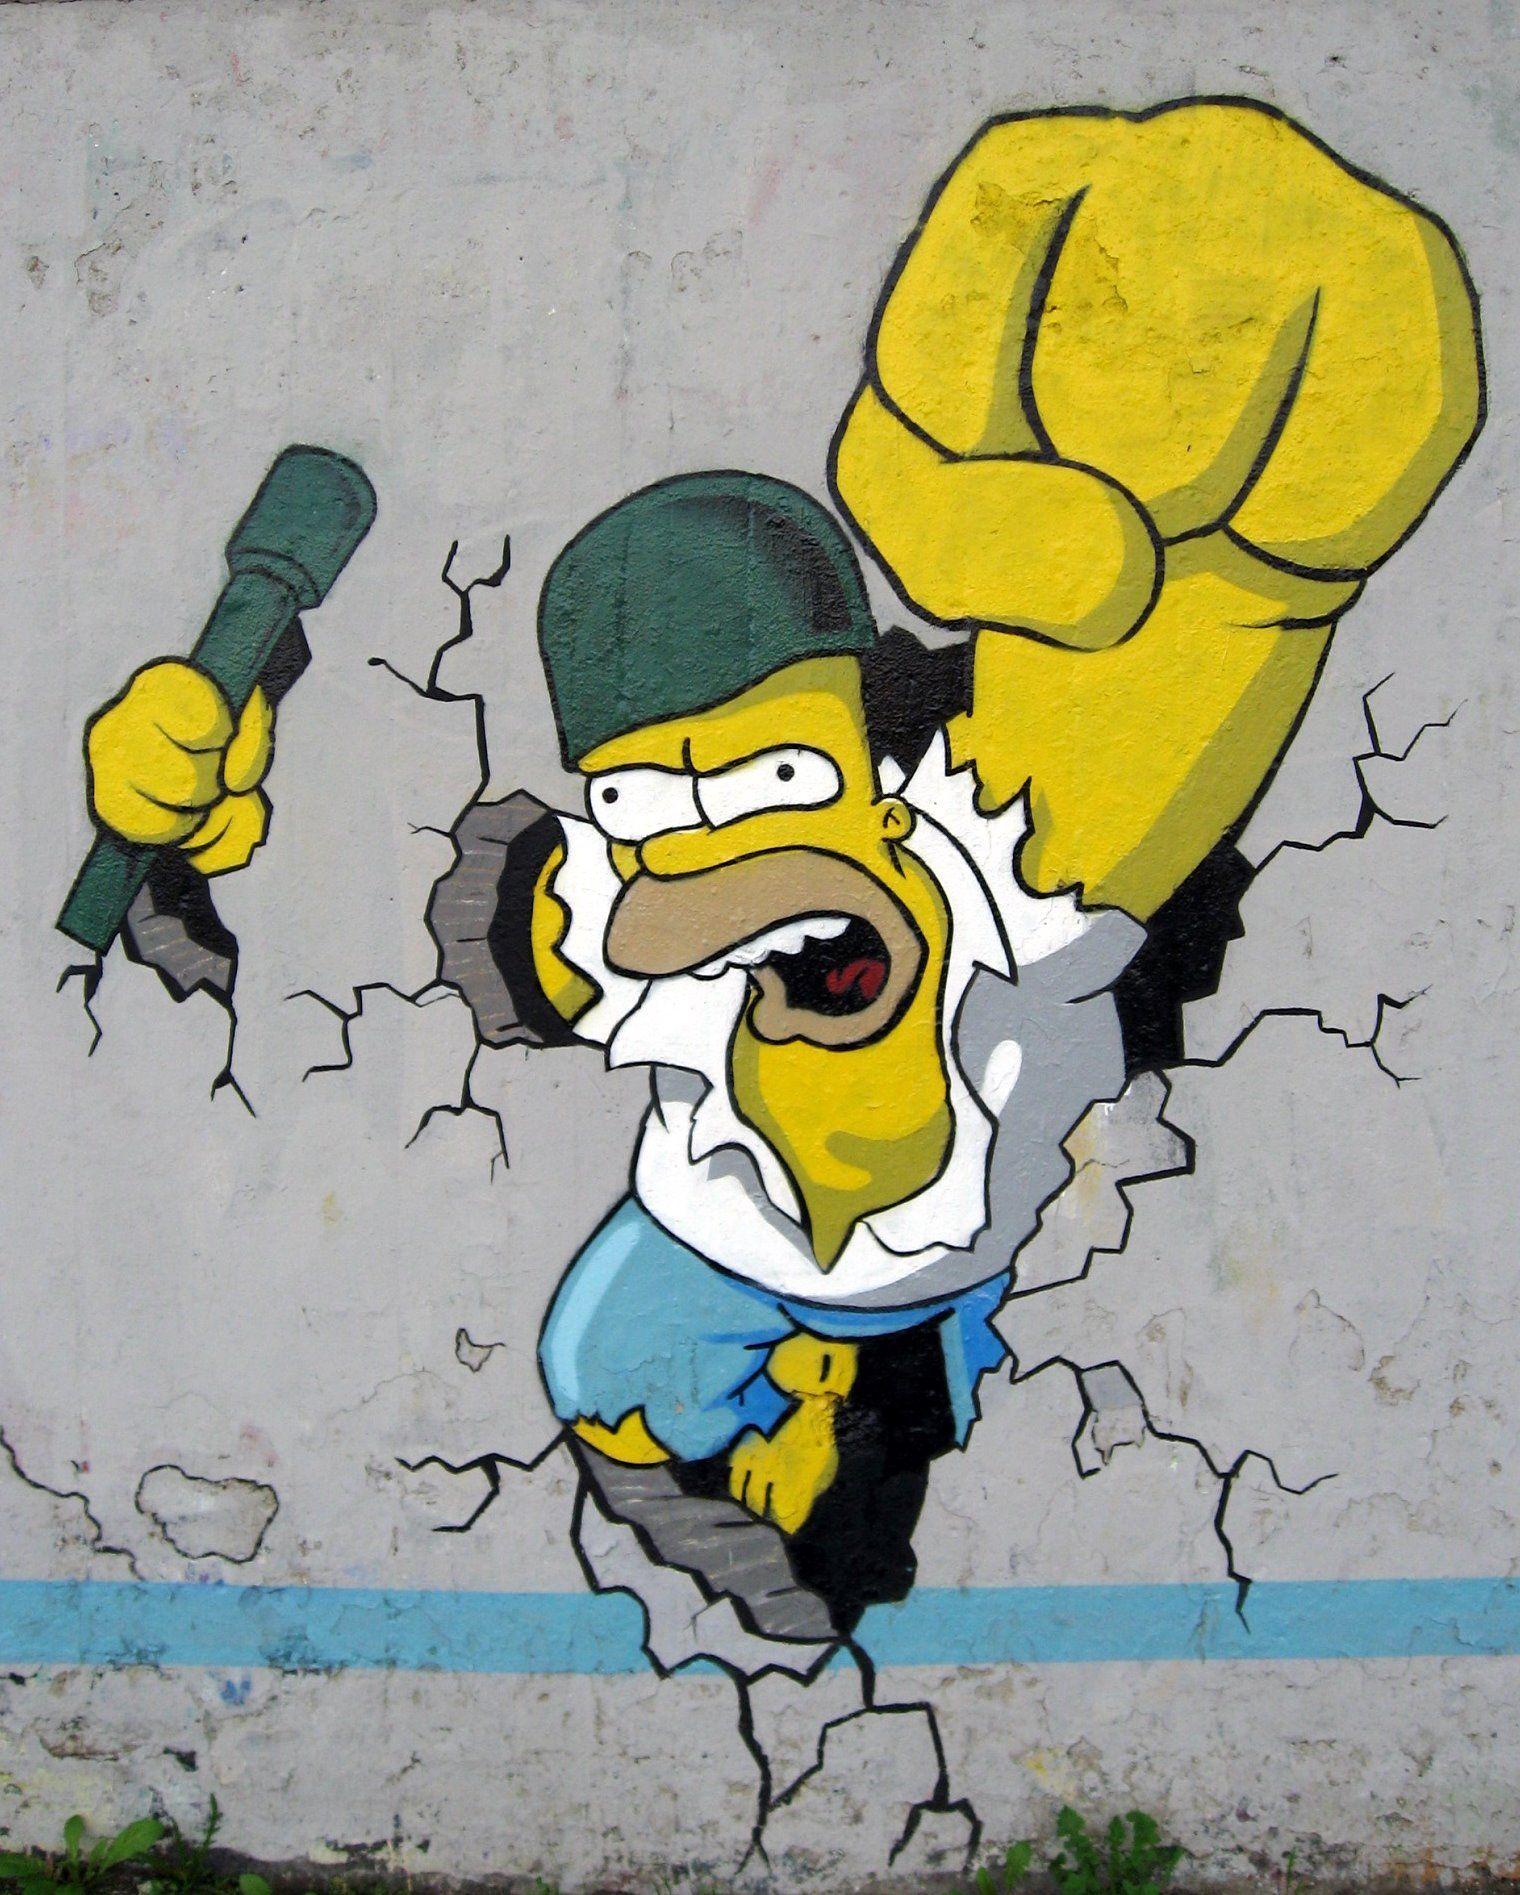 Homer Simpson by Nakor | The Simpsons | Pinterest | Homer simpson ...